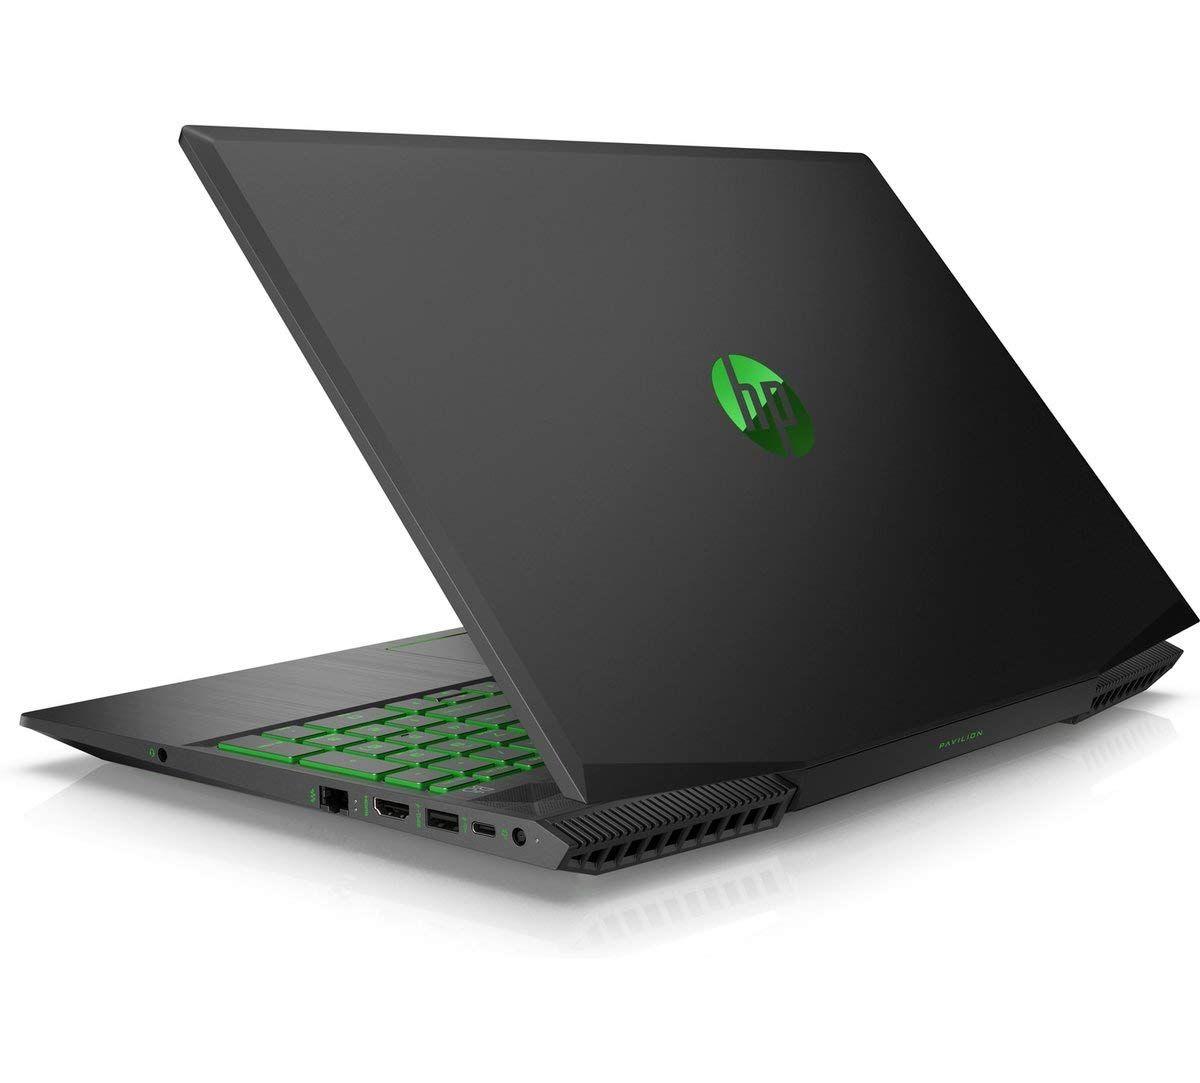 5 Best Gaming Laptop Under 1000 Dollars In 2019 Gamers Buying Guide Hp Laptop Best Gaming Laptop Gaming Laptops